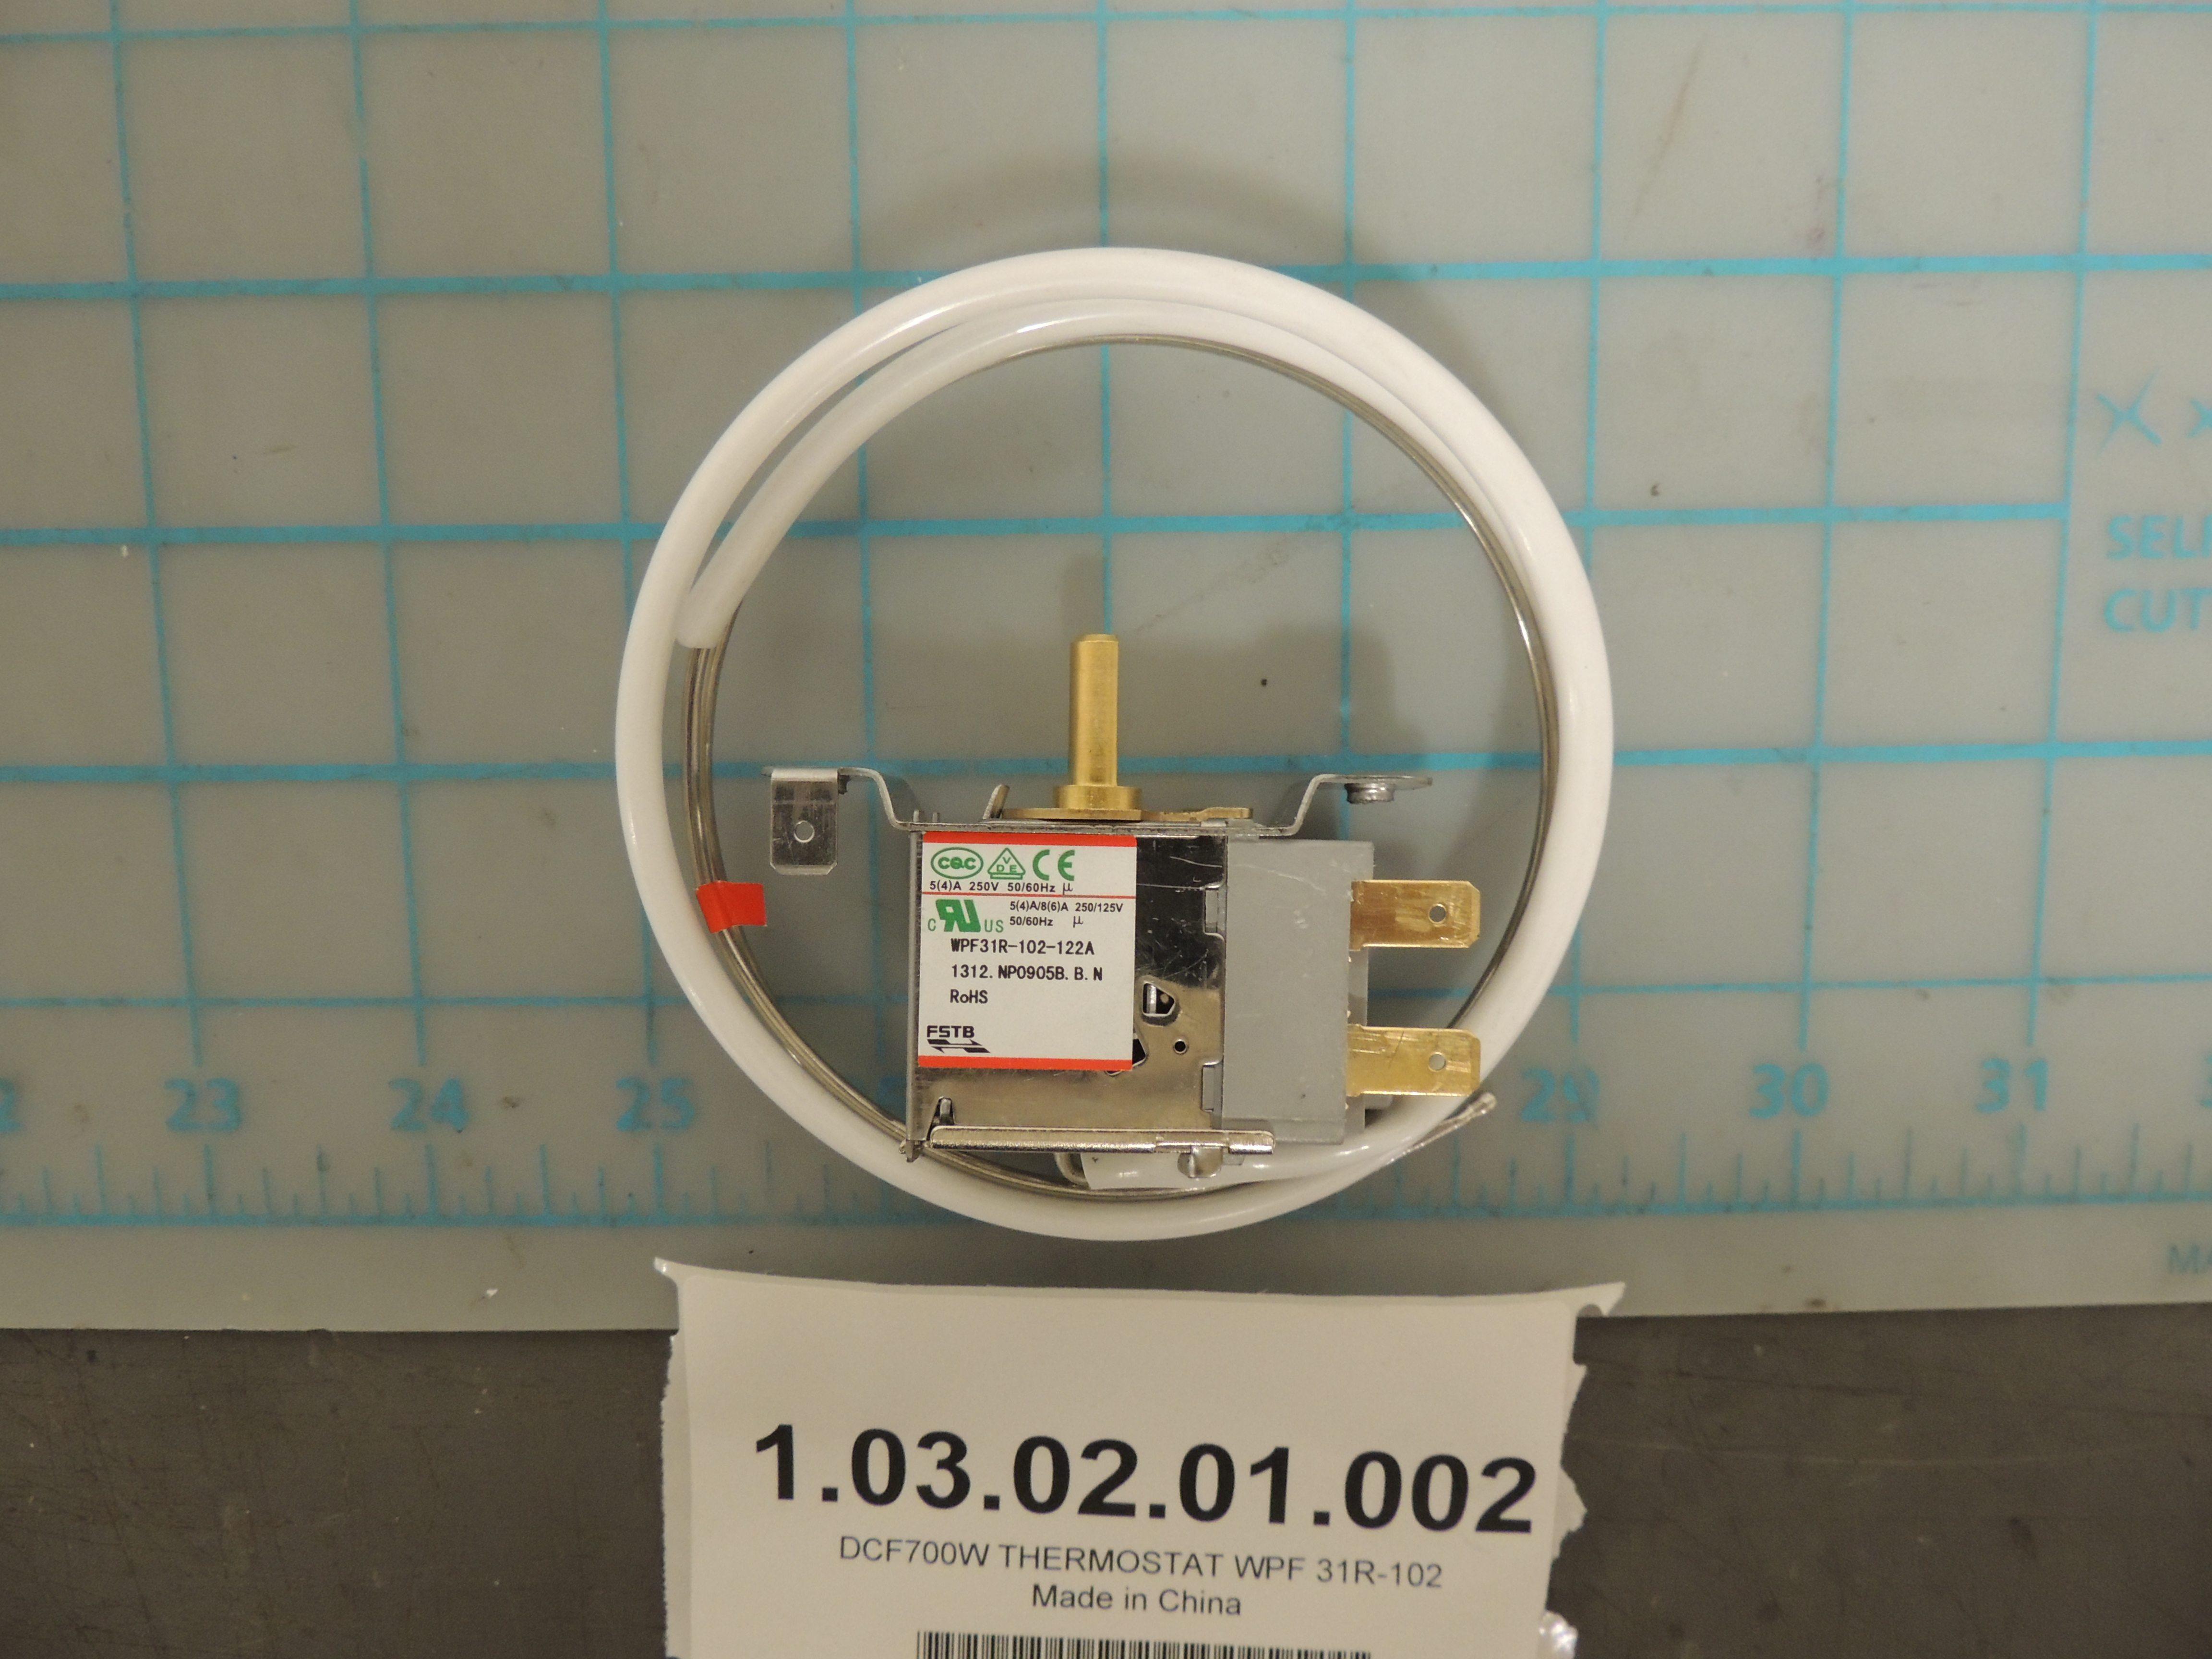 DCF700W THERMOSTAT WPF 31R-102